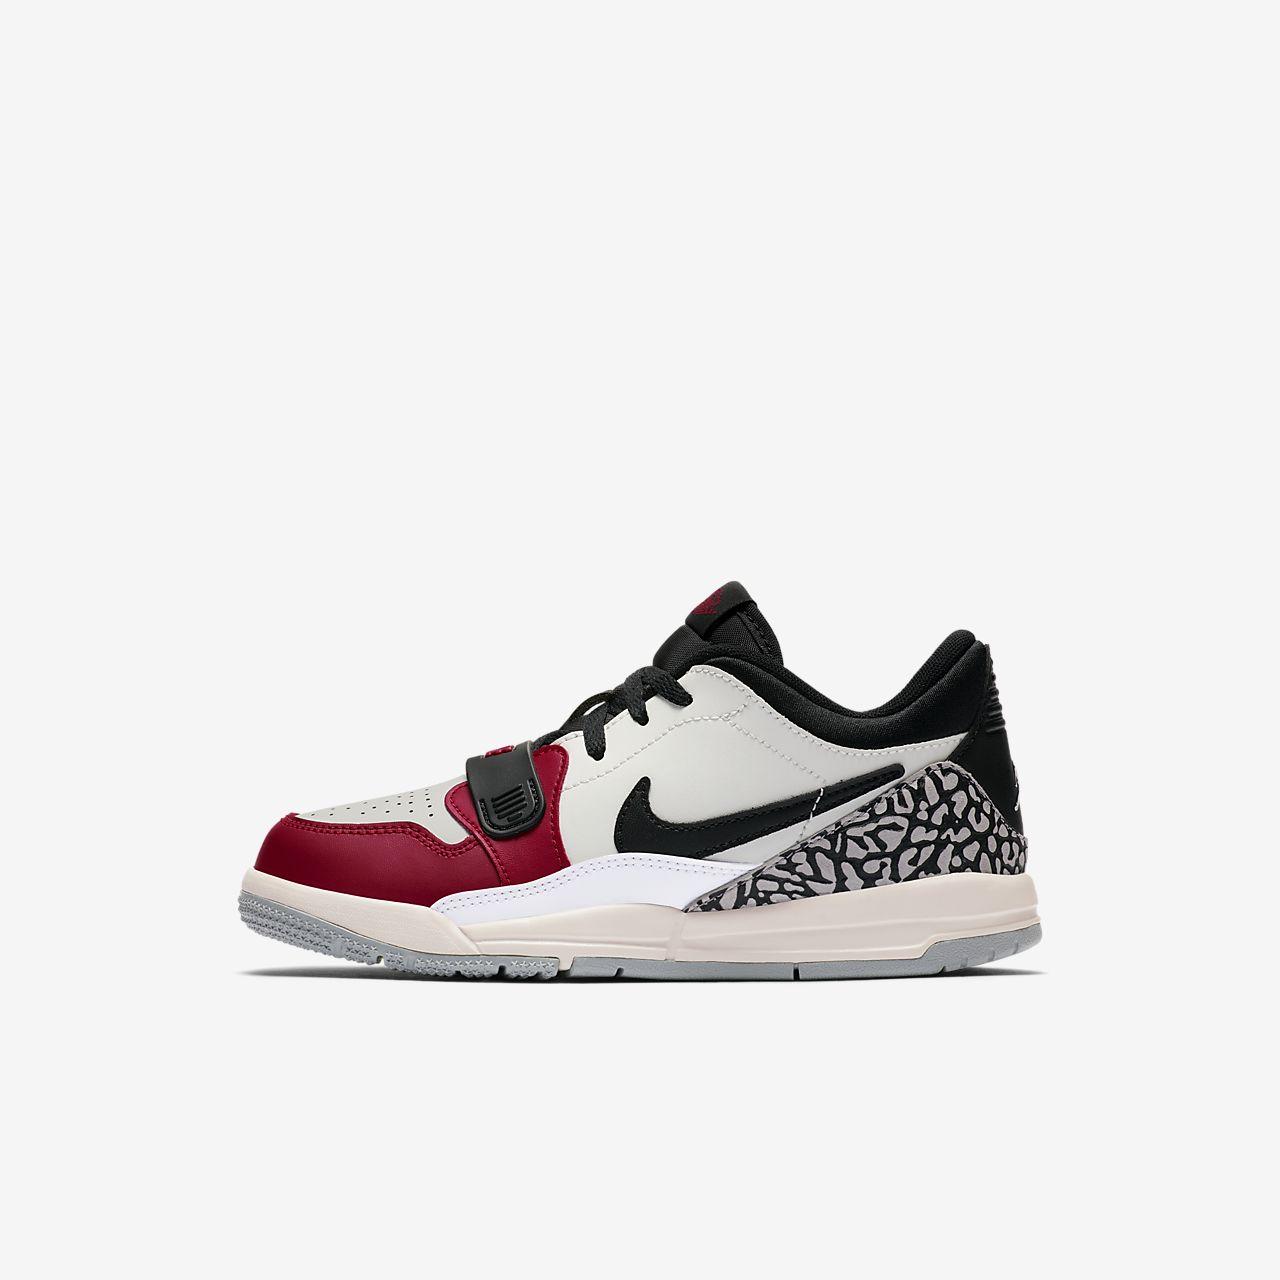 Air Jordan Legacy 312 Low Younger Kids' Shoe